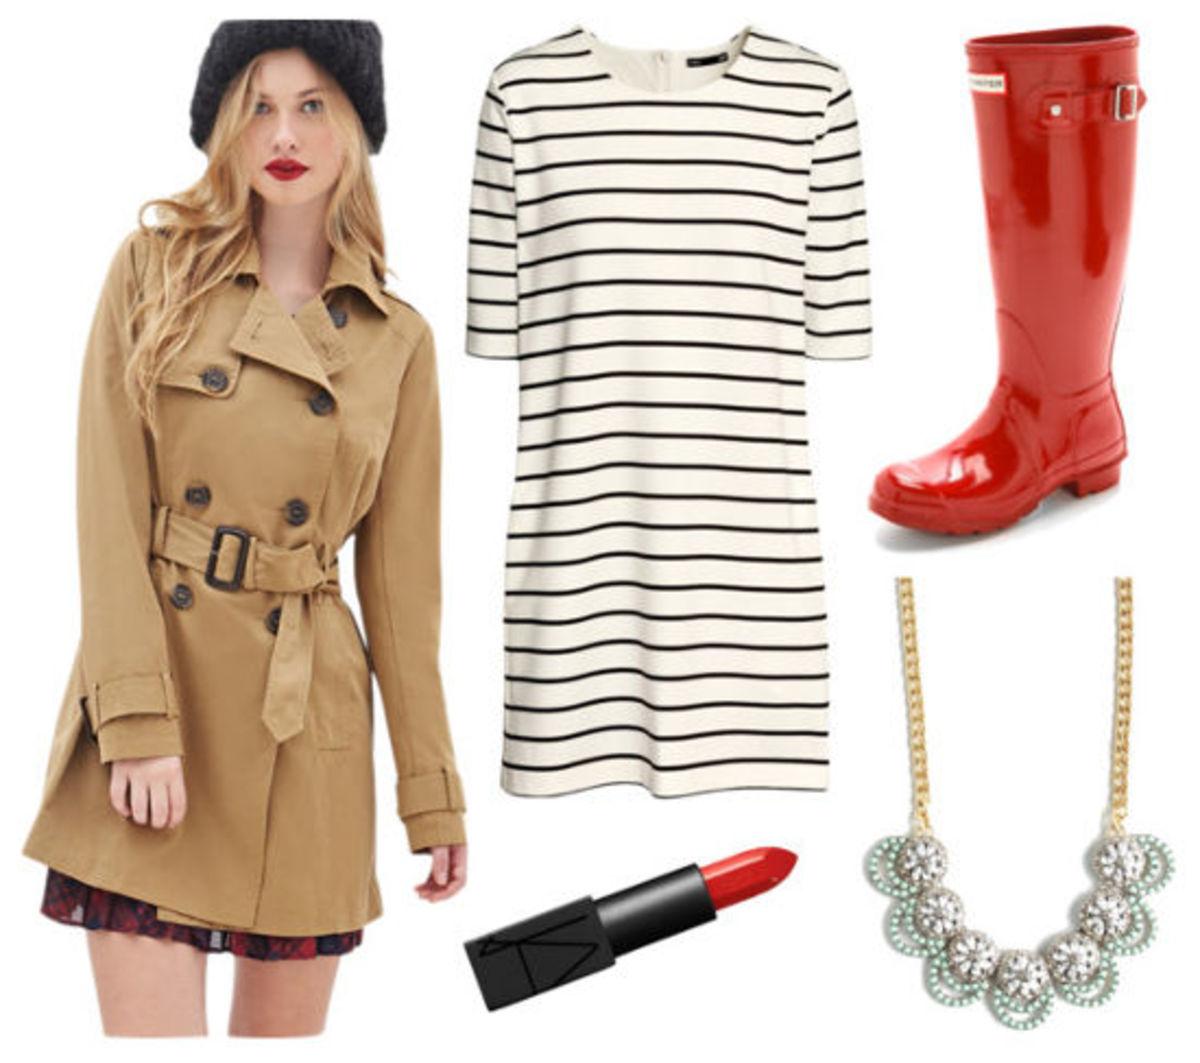 white-dress-tshirt-stripe-tan-jacket-coat-trench-red-shoe-boots-wellies-rain-bib-necklace-spring-summer-lunch.jpg